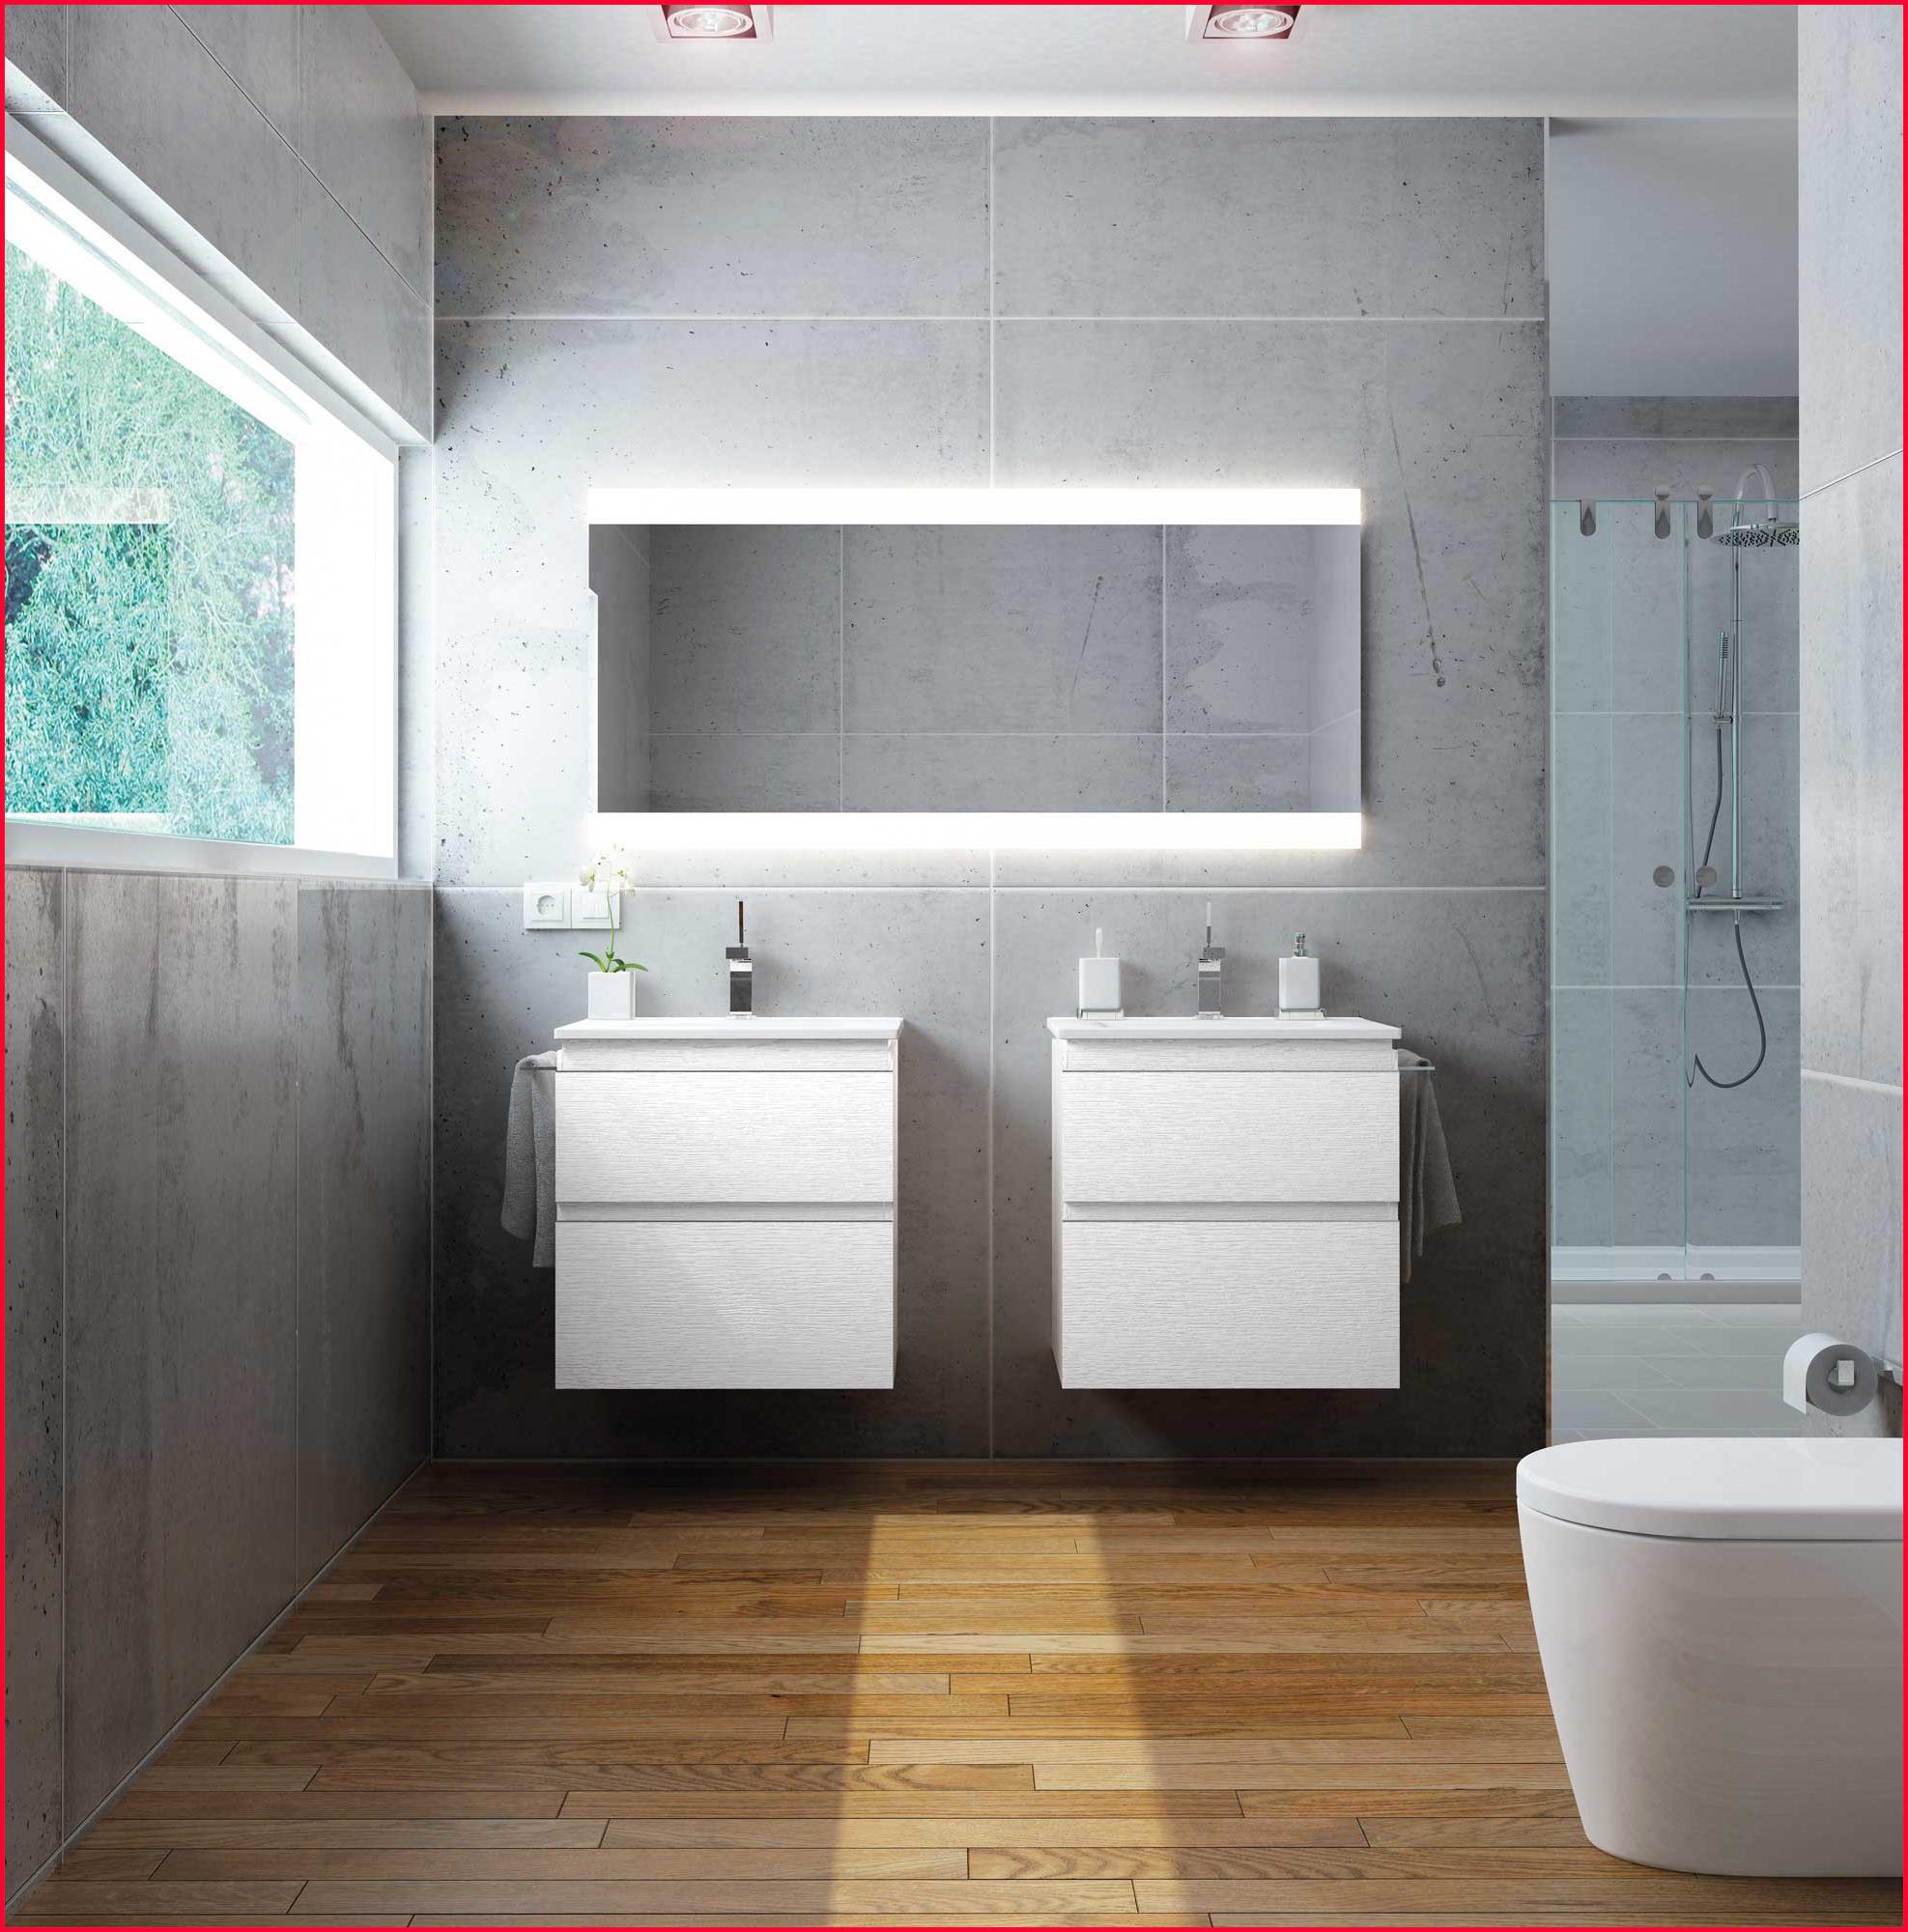 Muebles Para Baño J7do Aplique Baà O Muebles Para BaO Encantador Banos Modernos